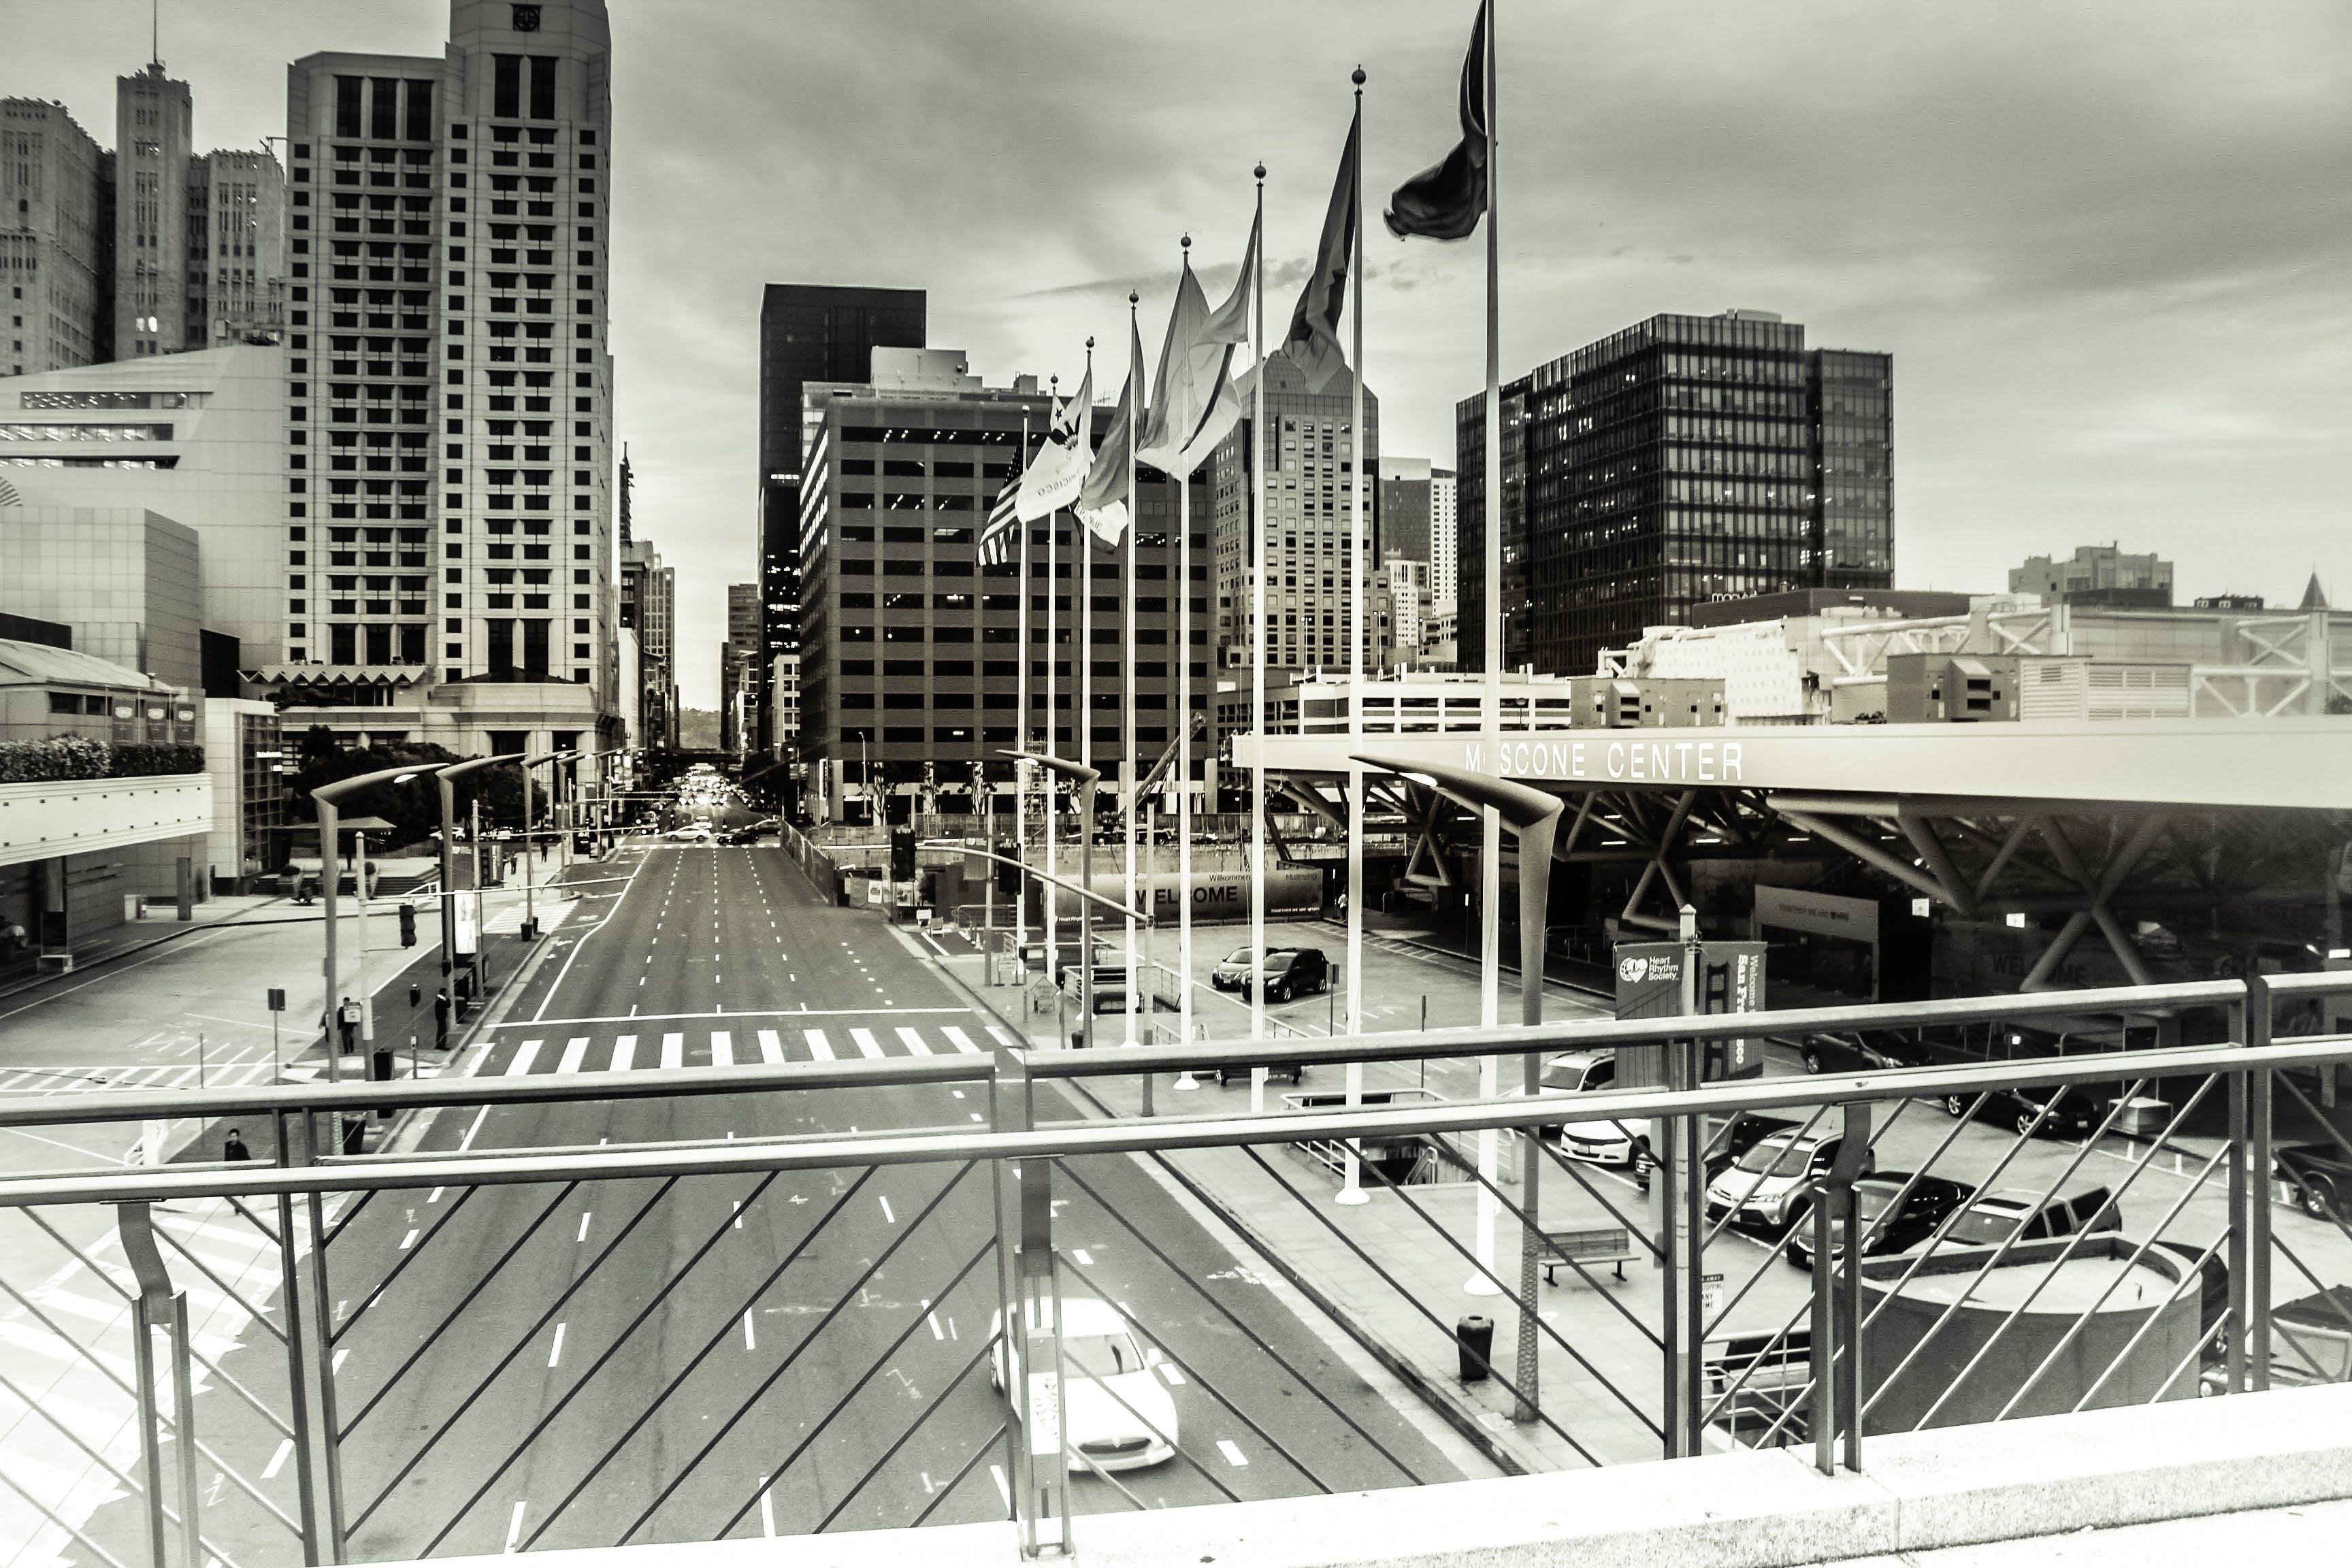 Free stock photo of #sanfransisco #blackandwhite #canon #sf #city